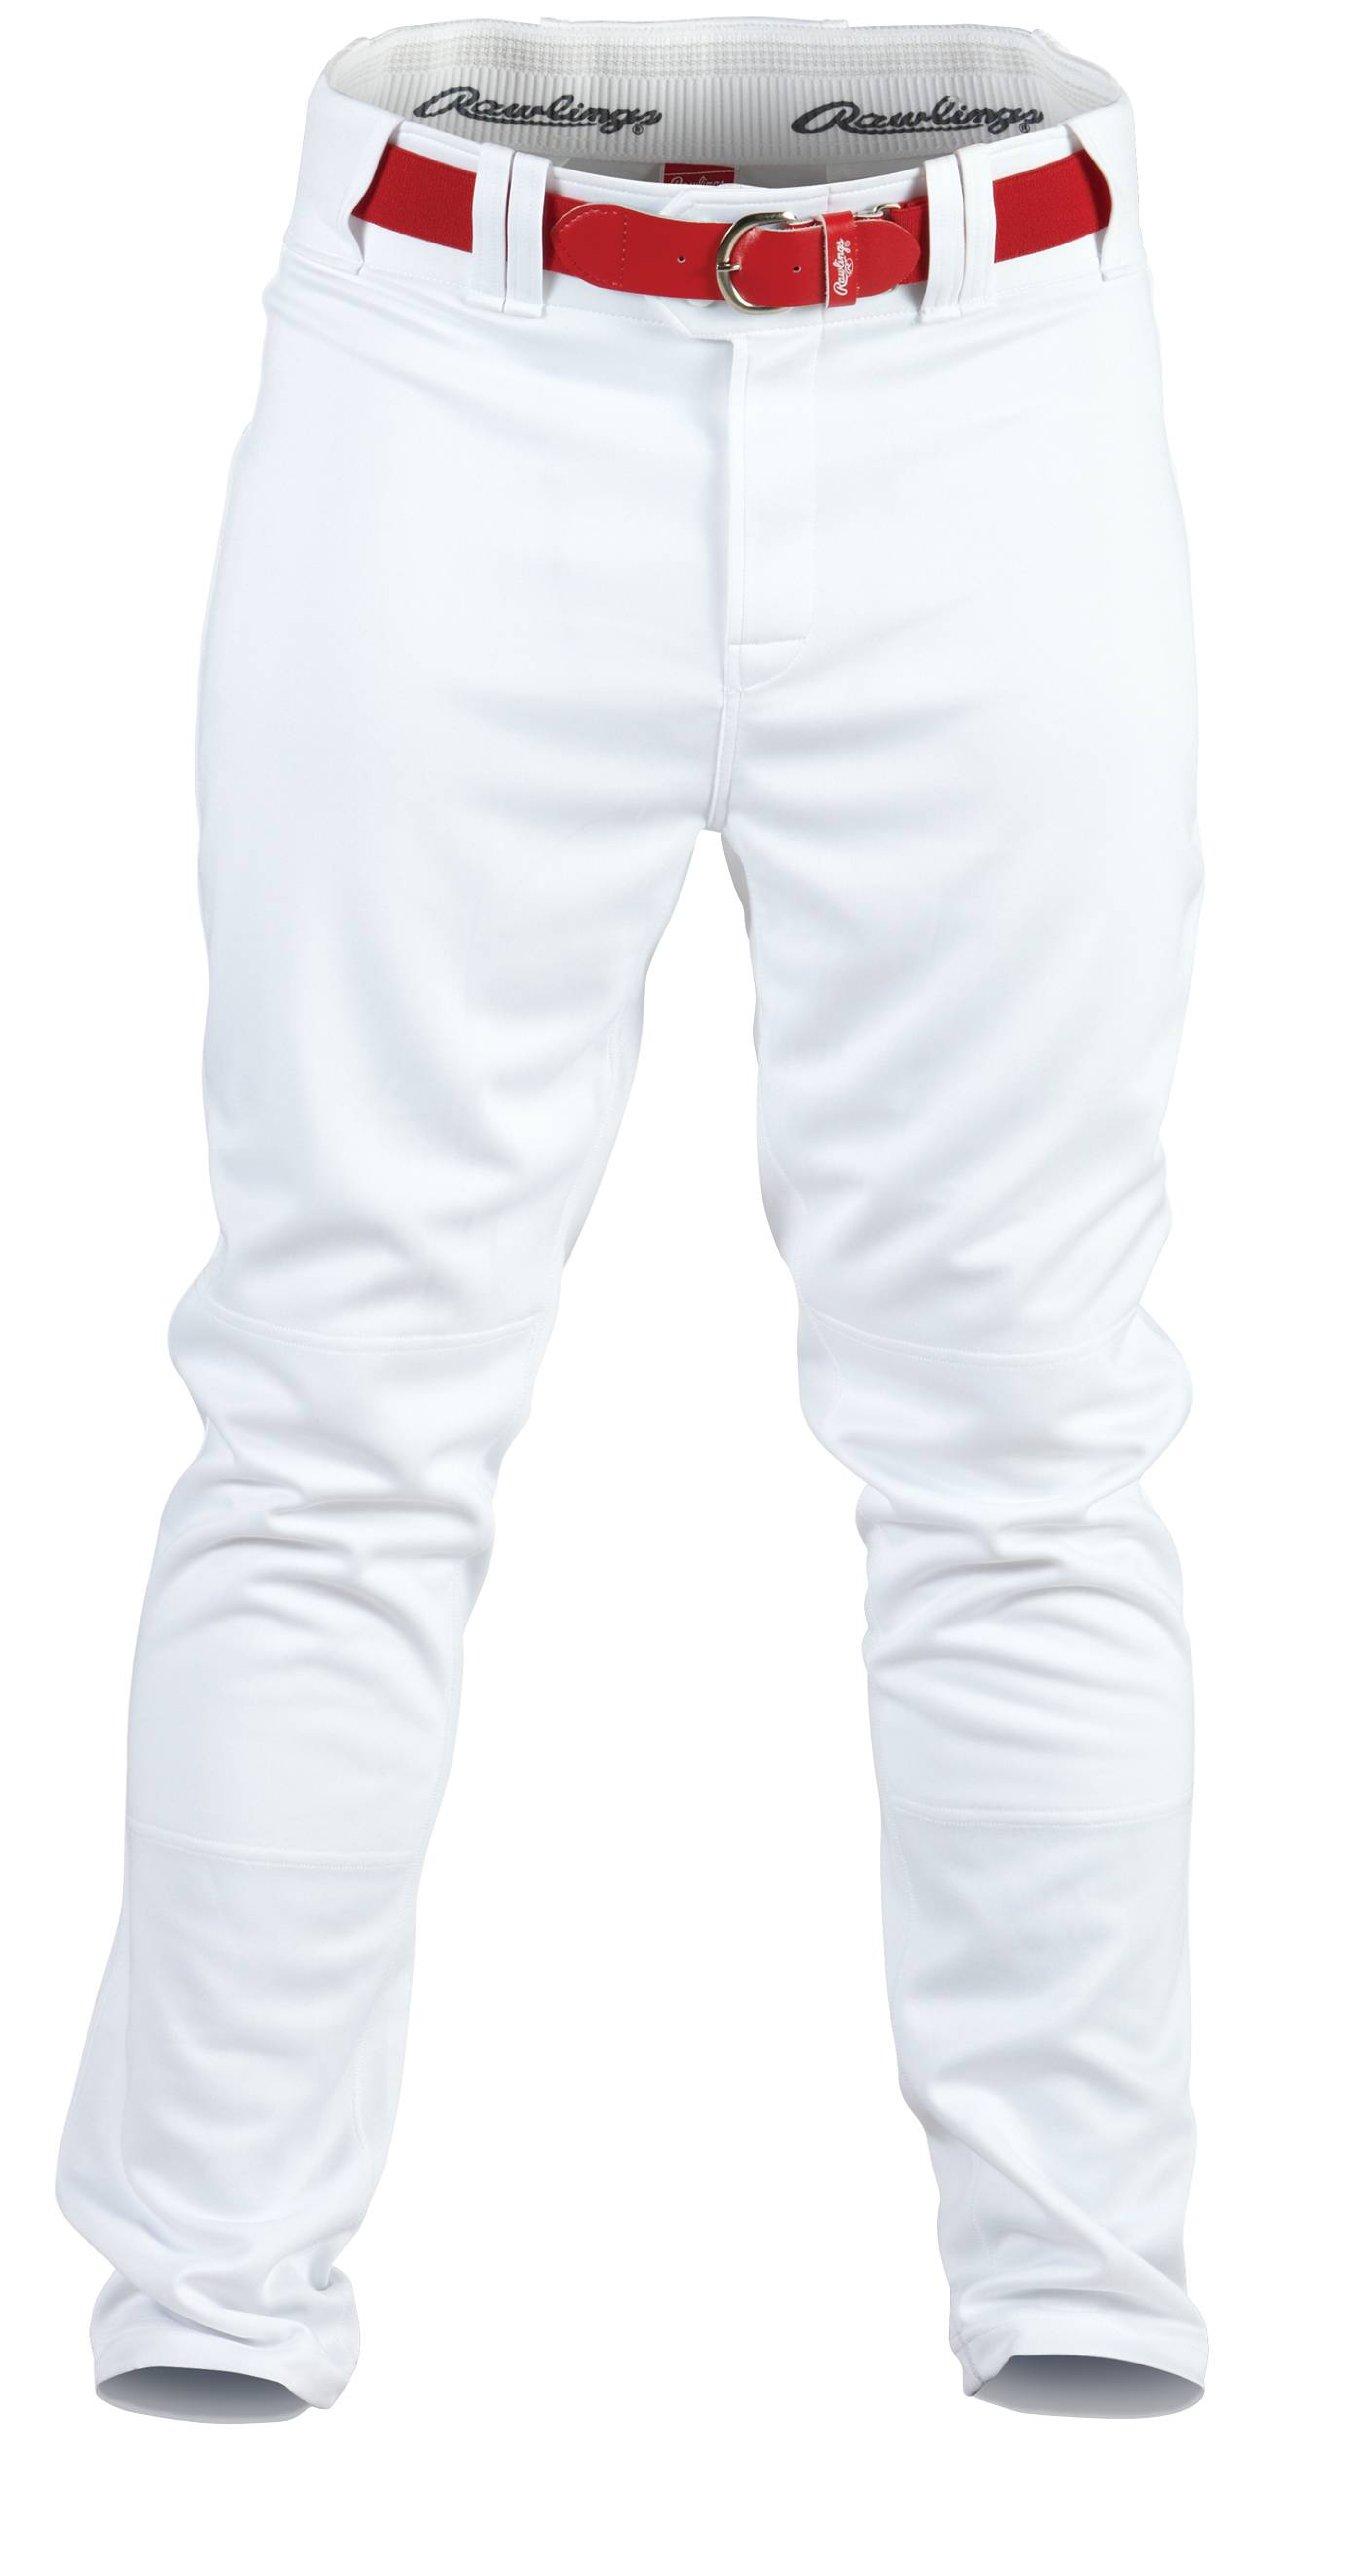 Rawlings Men's Baseball Pant (White, Medium) by Rawlings Sporting Goods